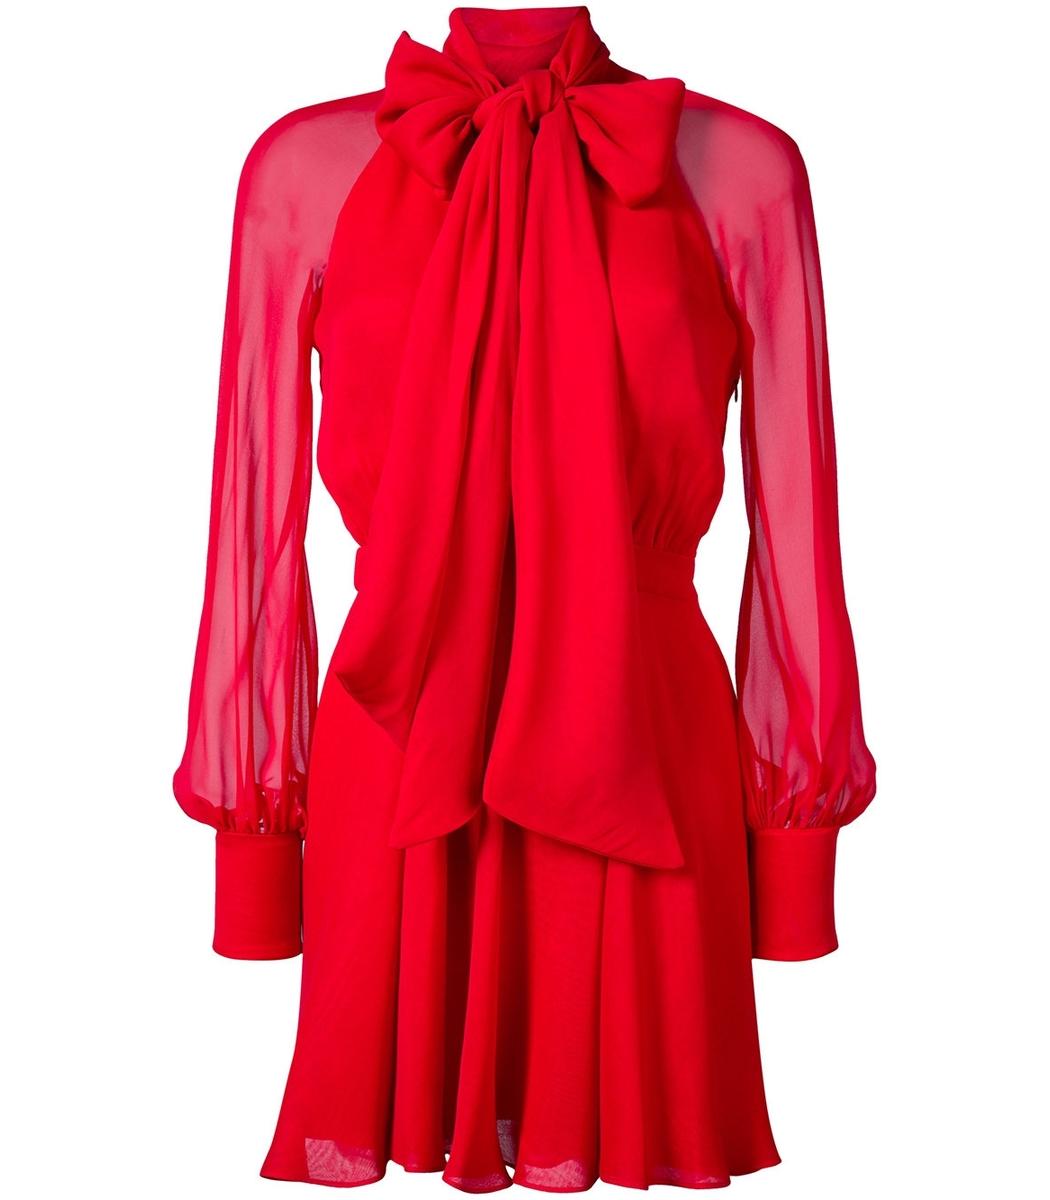 Haney Cinched Waist Dress